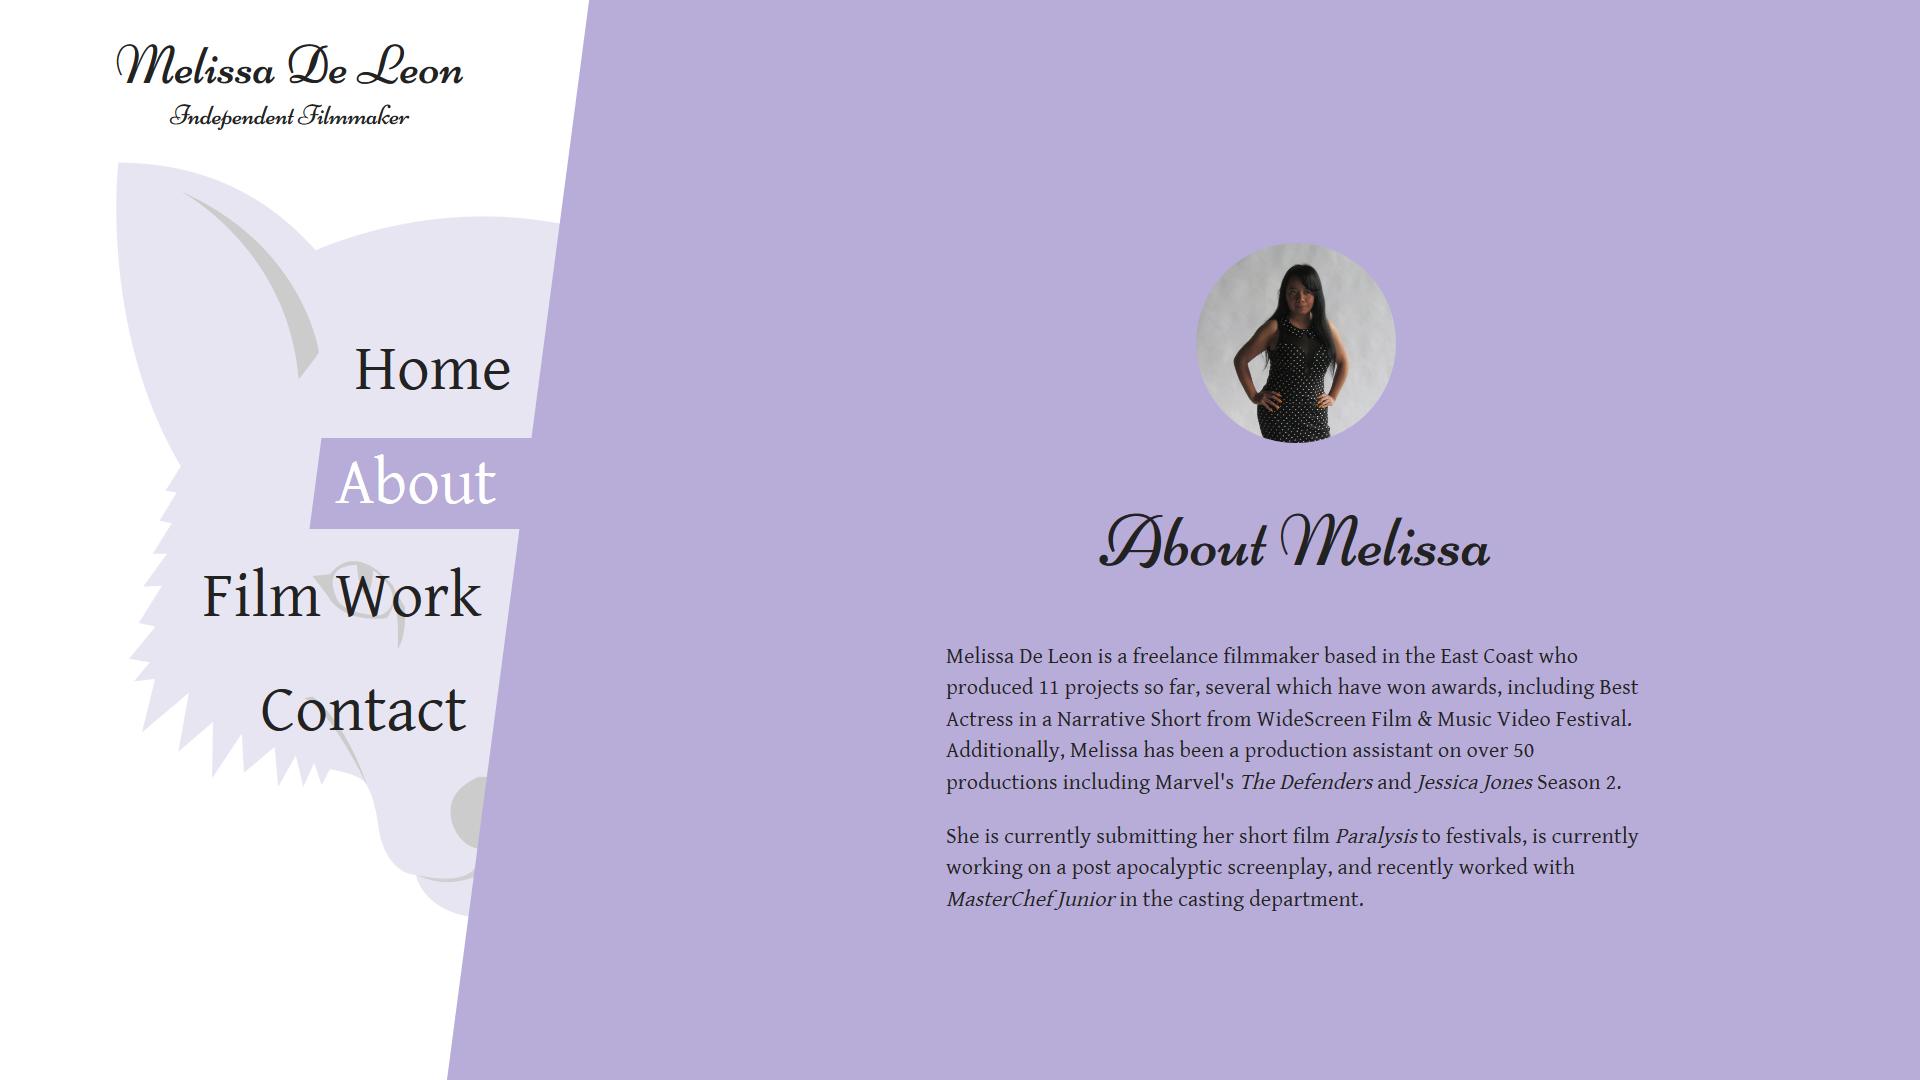 [Melissa De Leon's Website/Logo](http://melissadeleon.me)